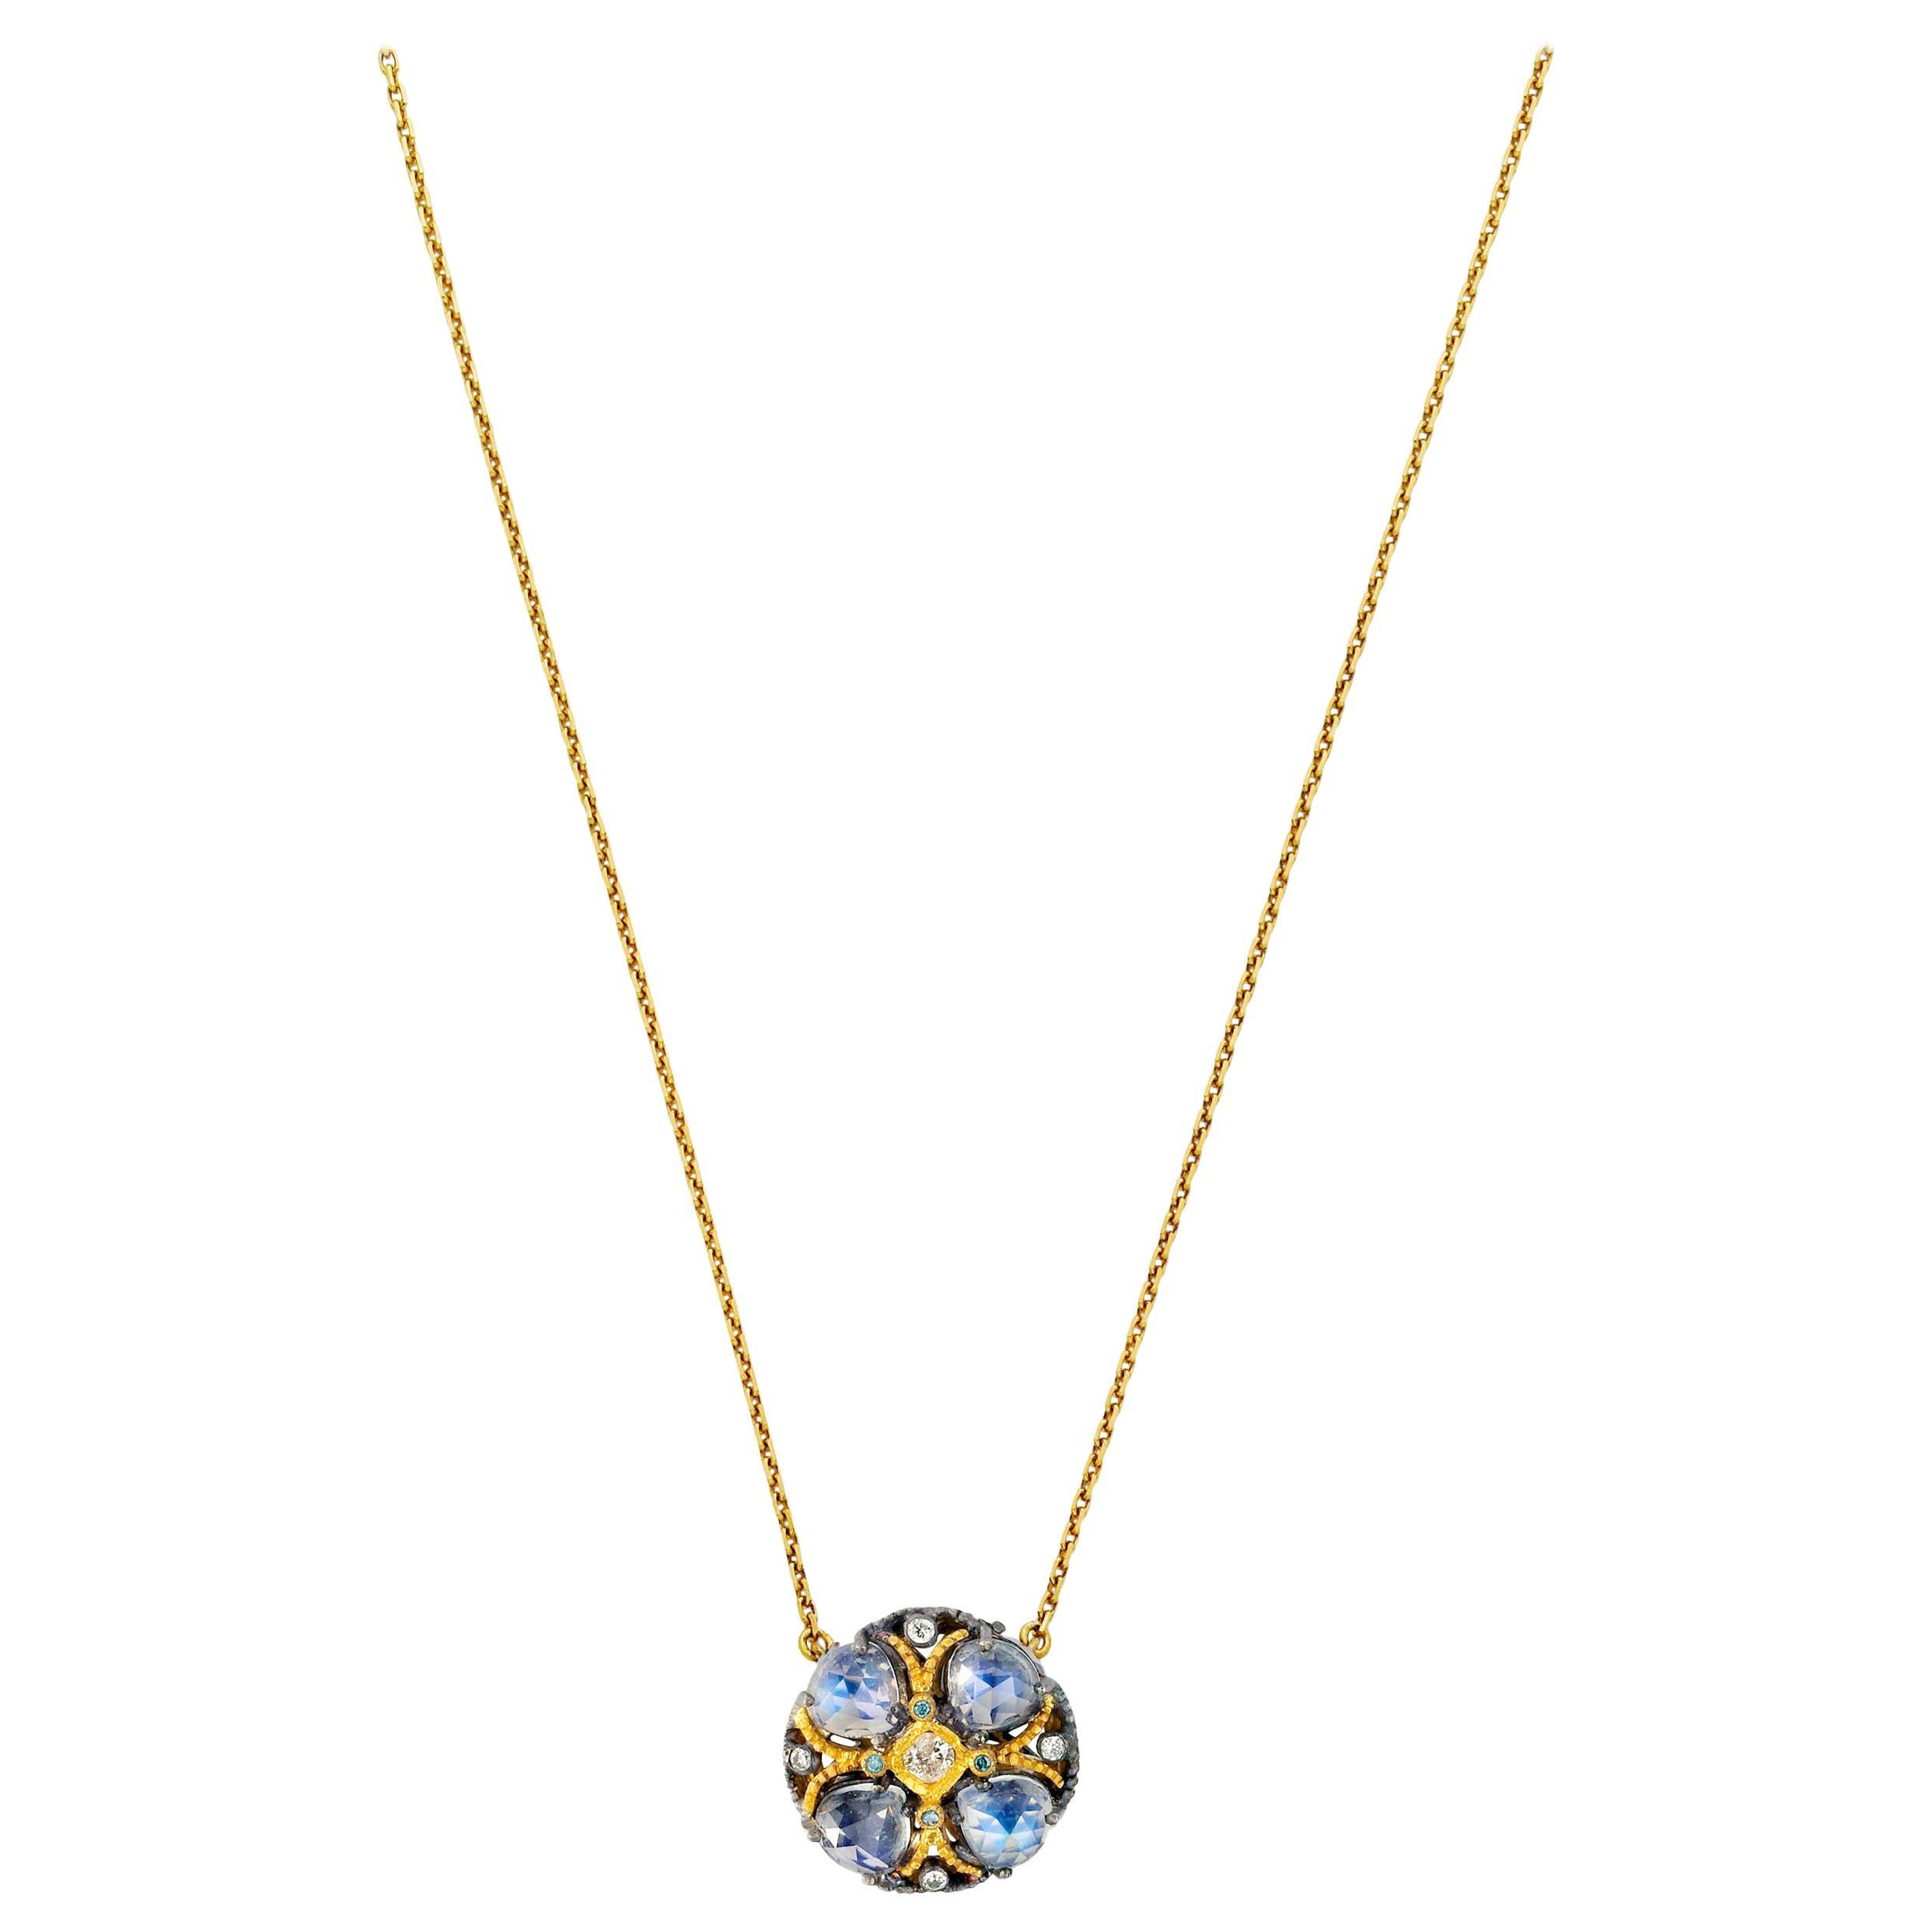 Suneera Moonstone Diamond Blackened Silver and 18 Karat Gold Pendant Necklace